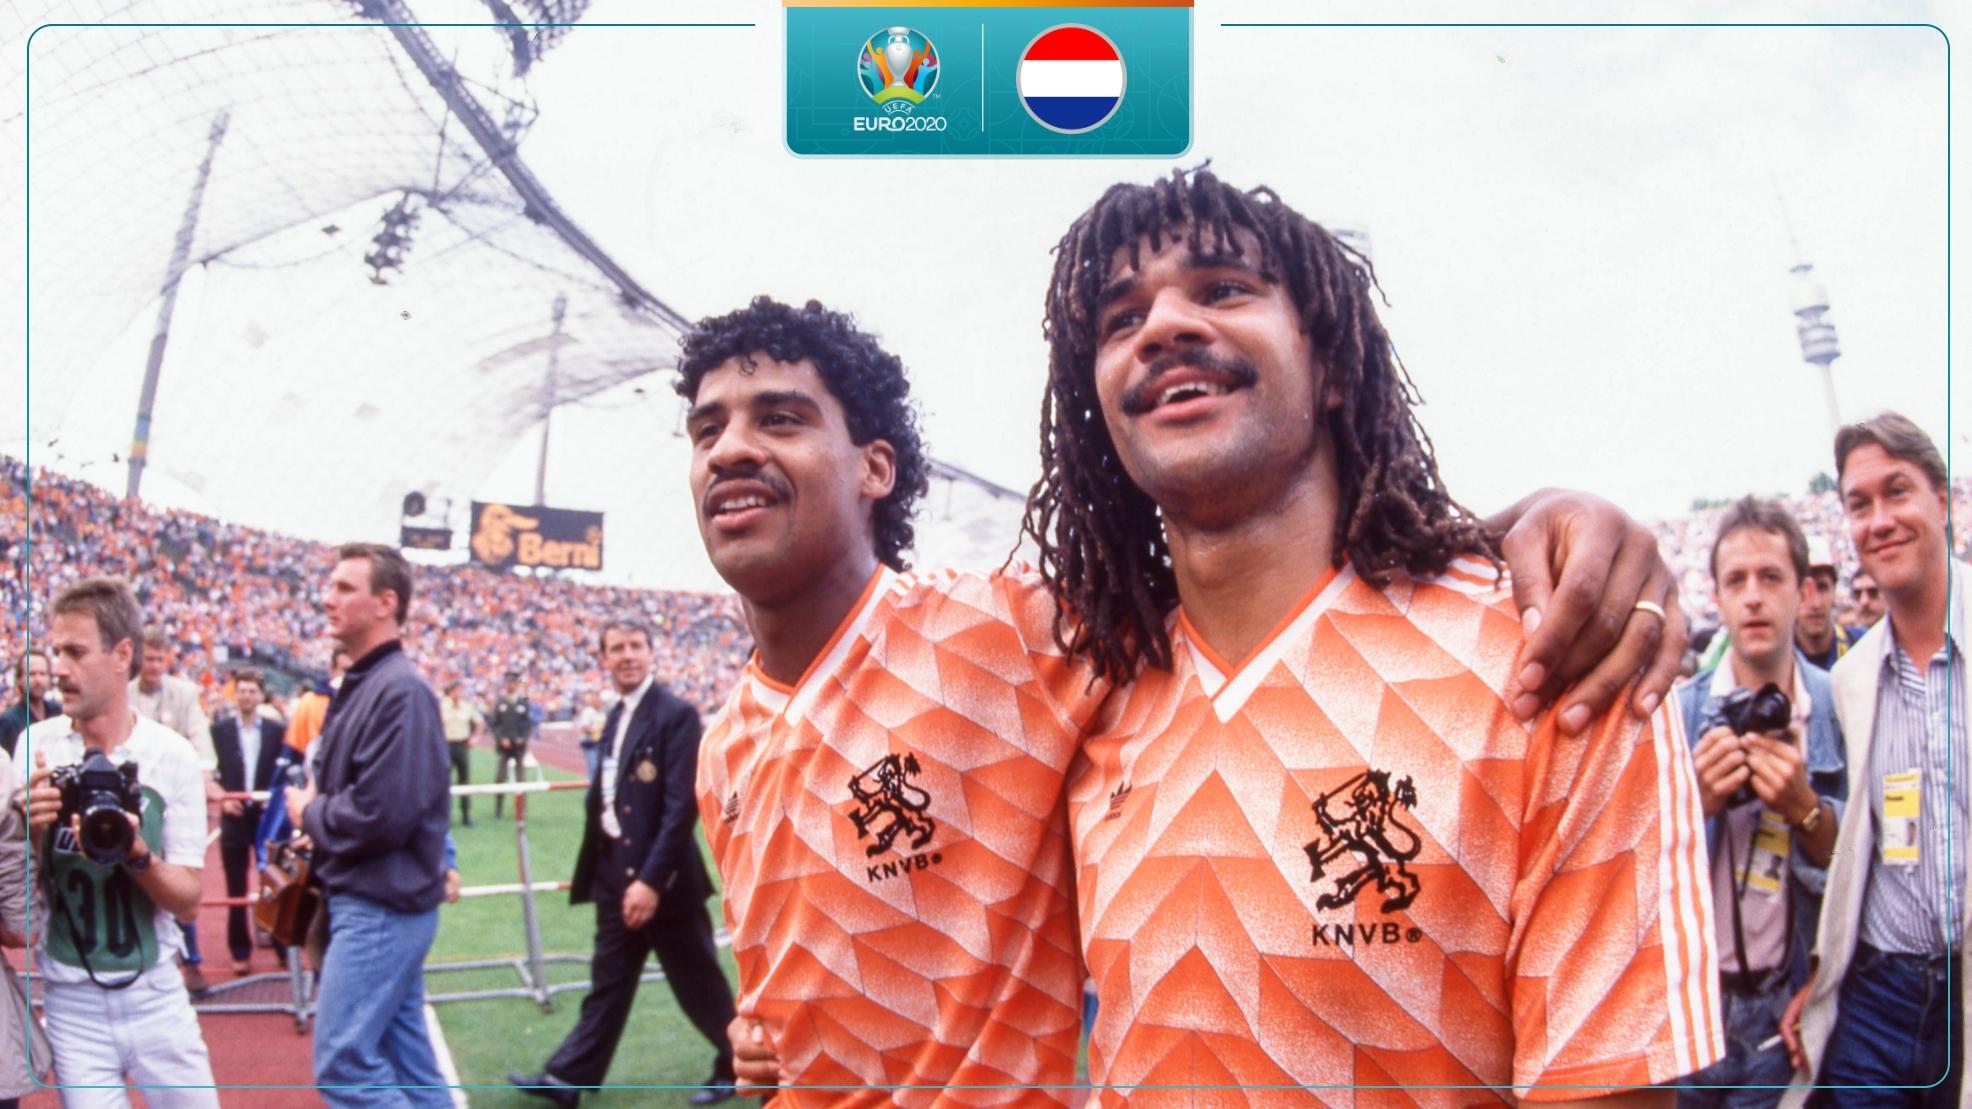 EURO 2020 contenders: Netherlands